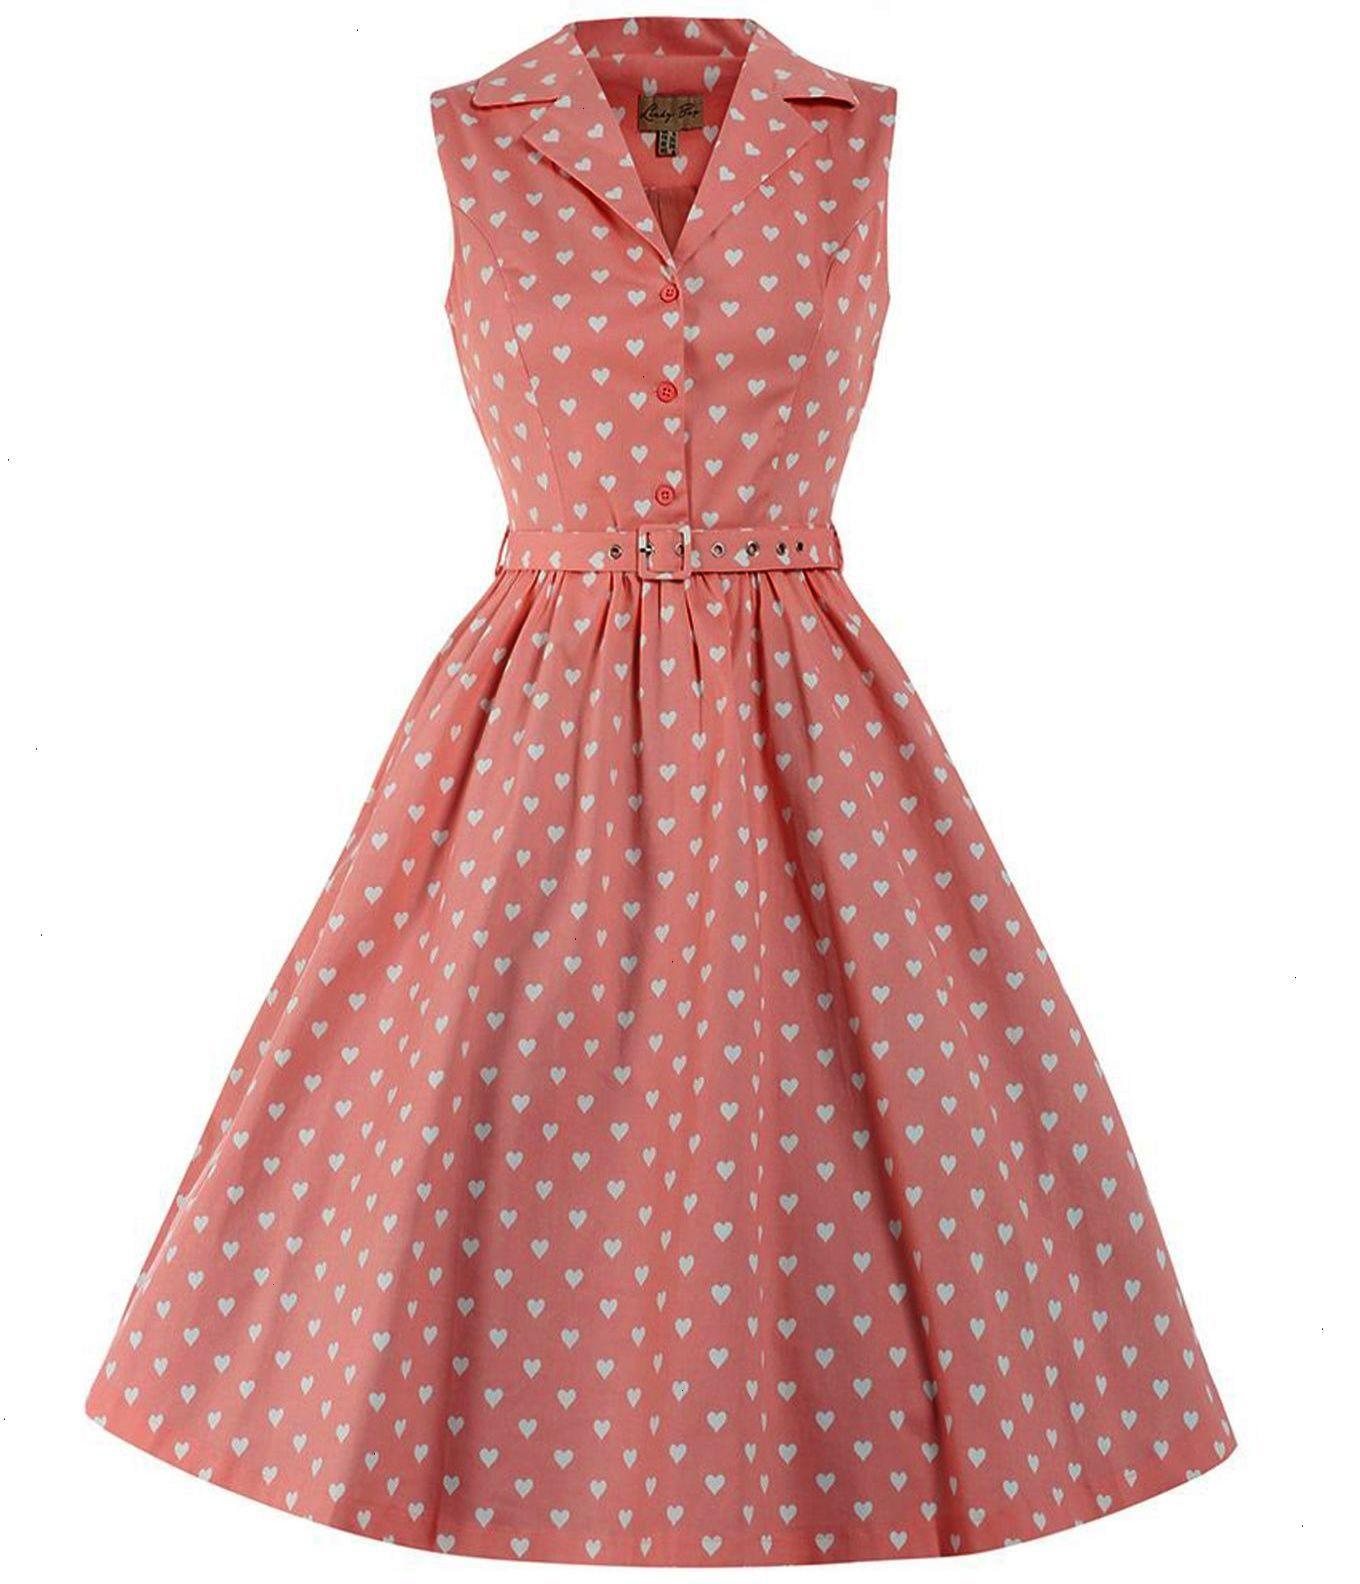 Vintage Dress Patterns For Sale 50s Rockabilly Dress Amazon  c2d122b1511